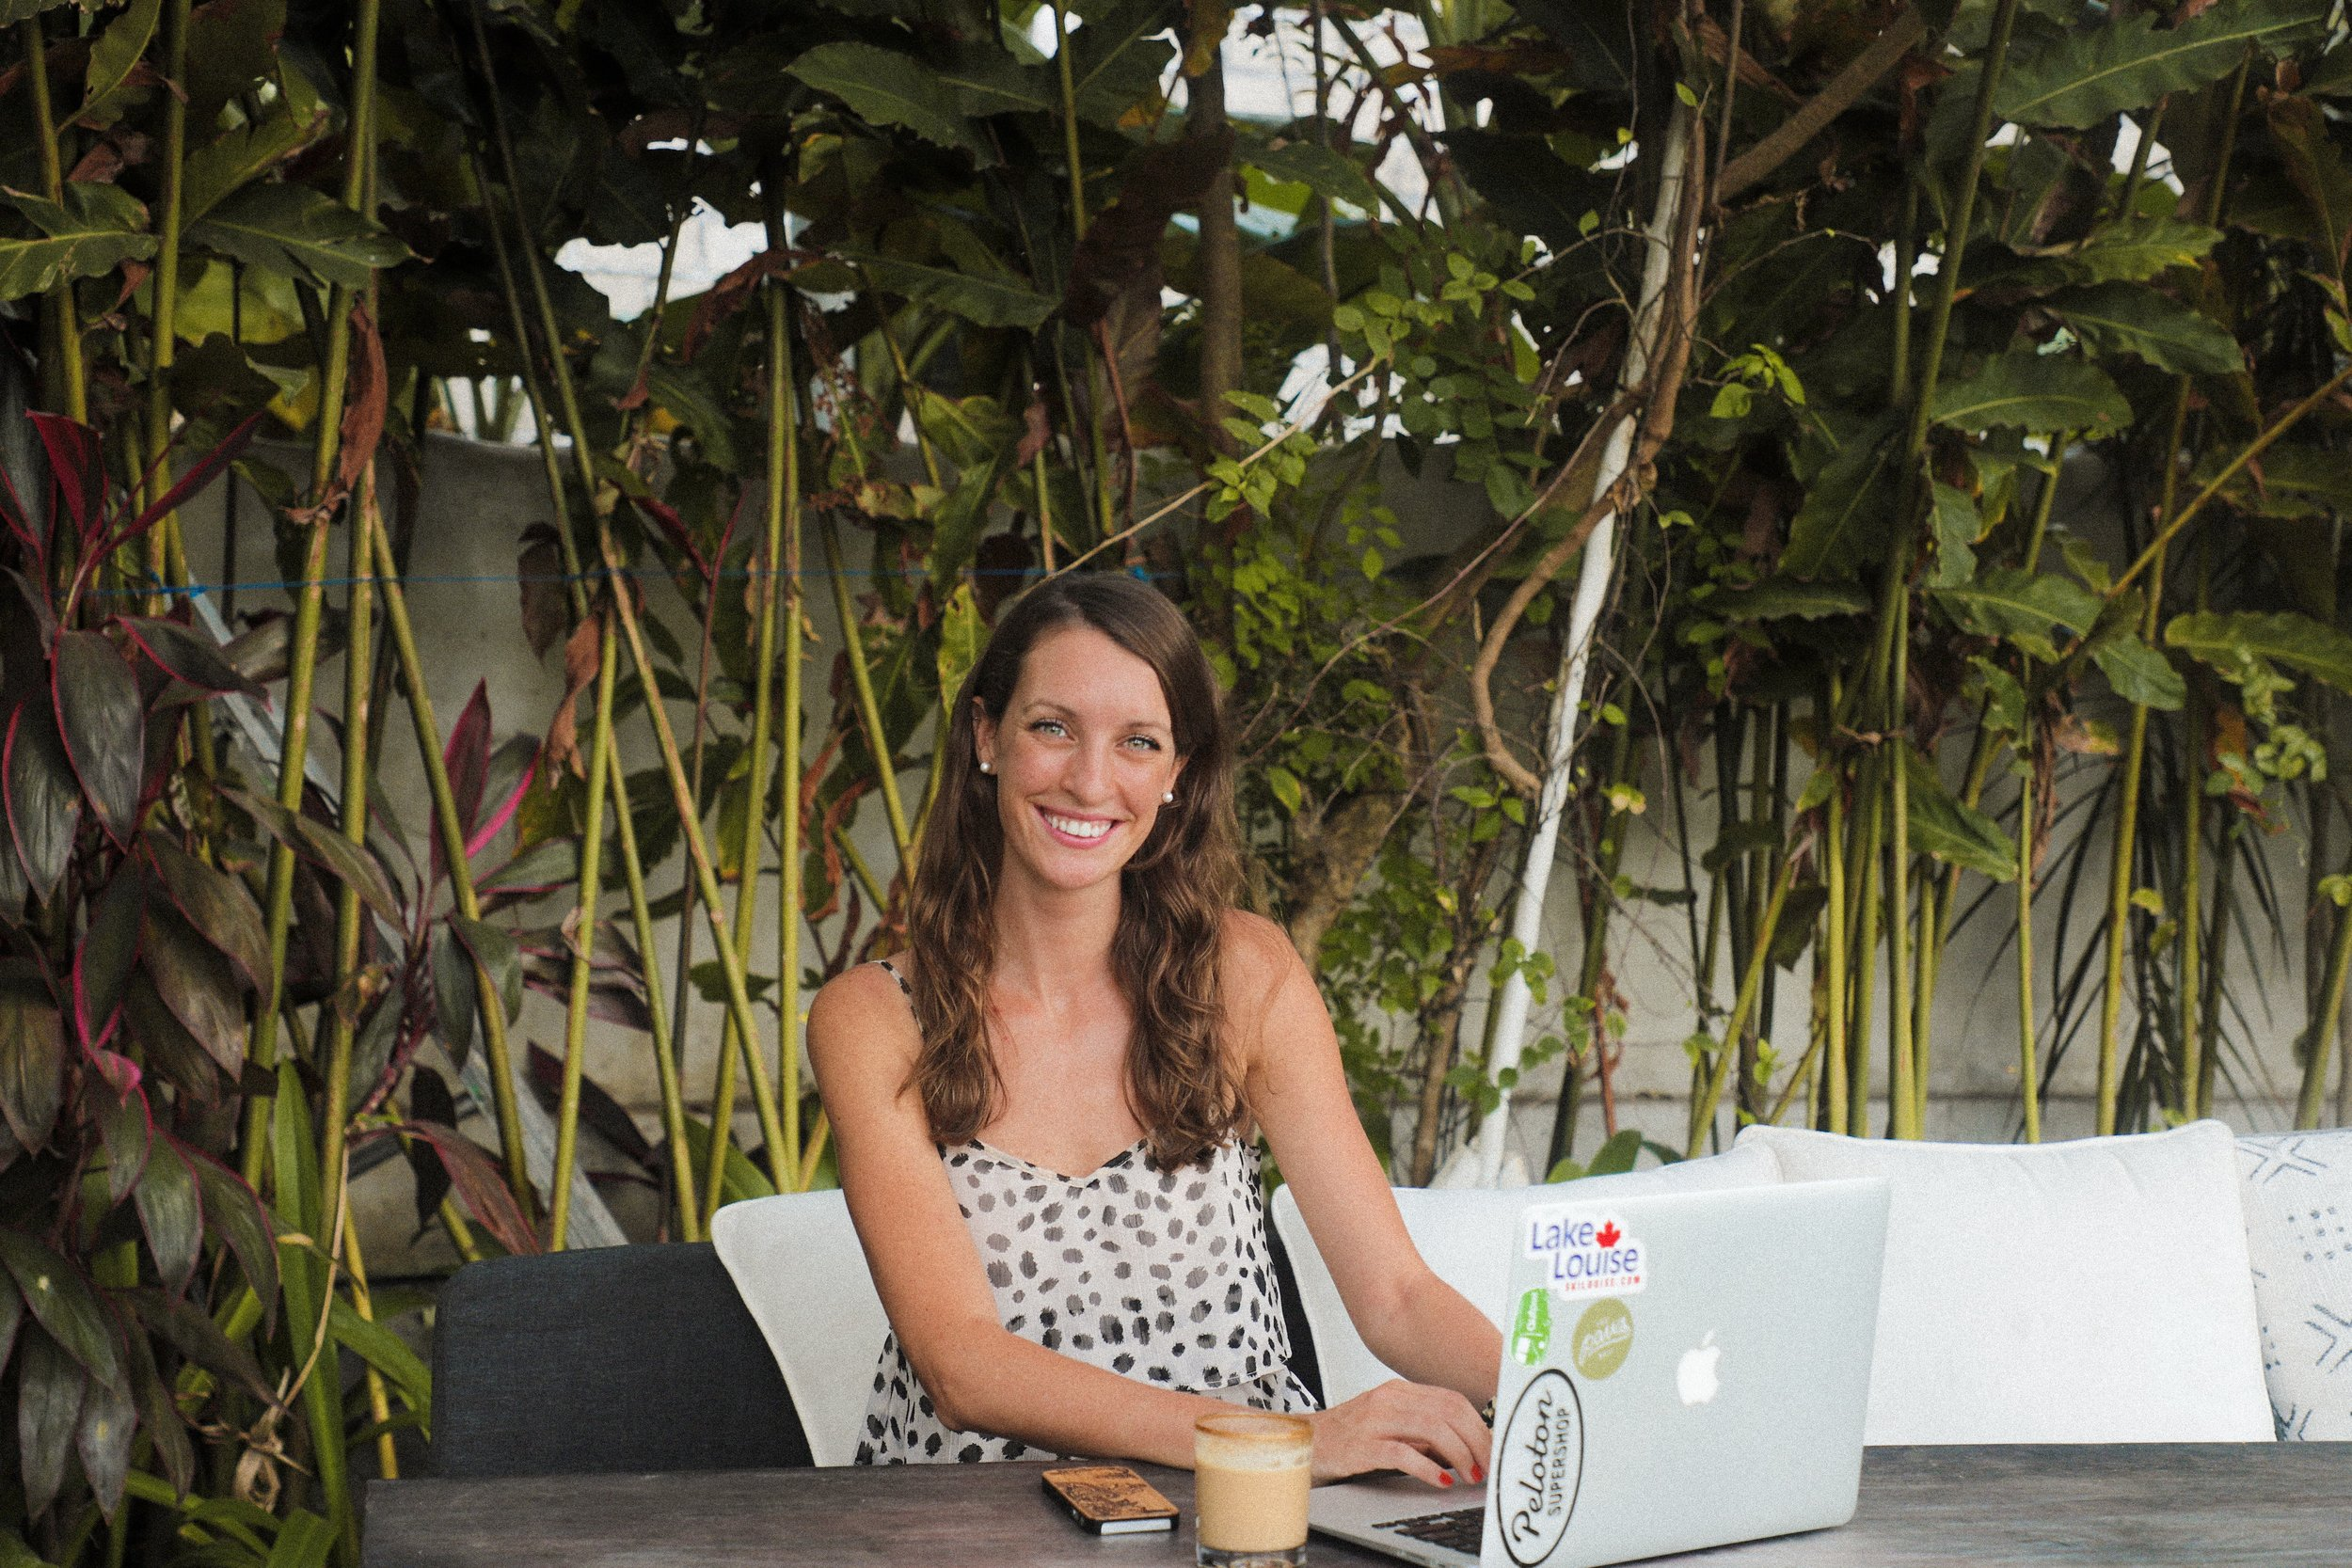 Charlotte O'Hara headshot | Squarespace web designer developer and online educator